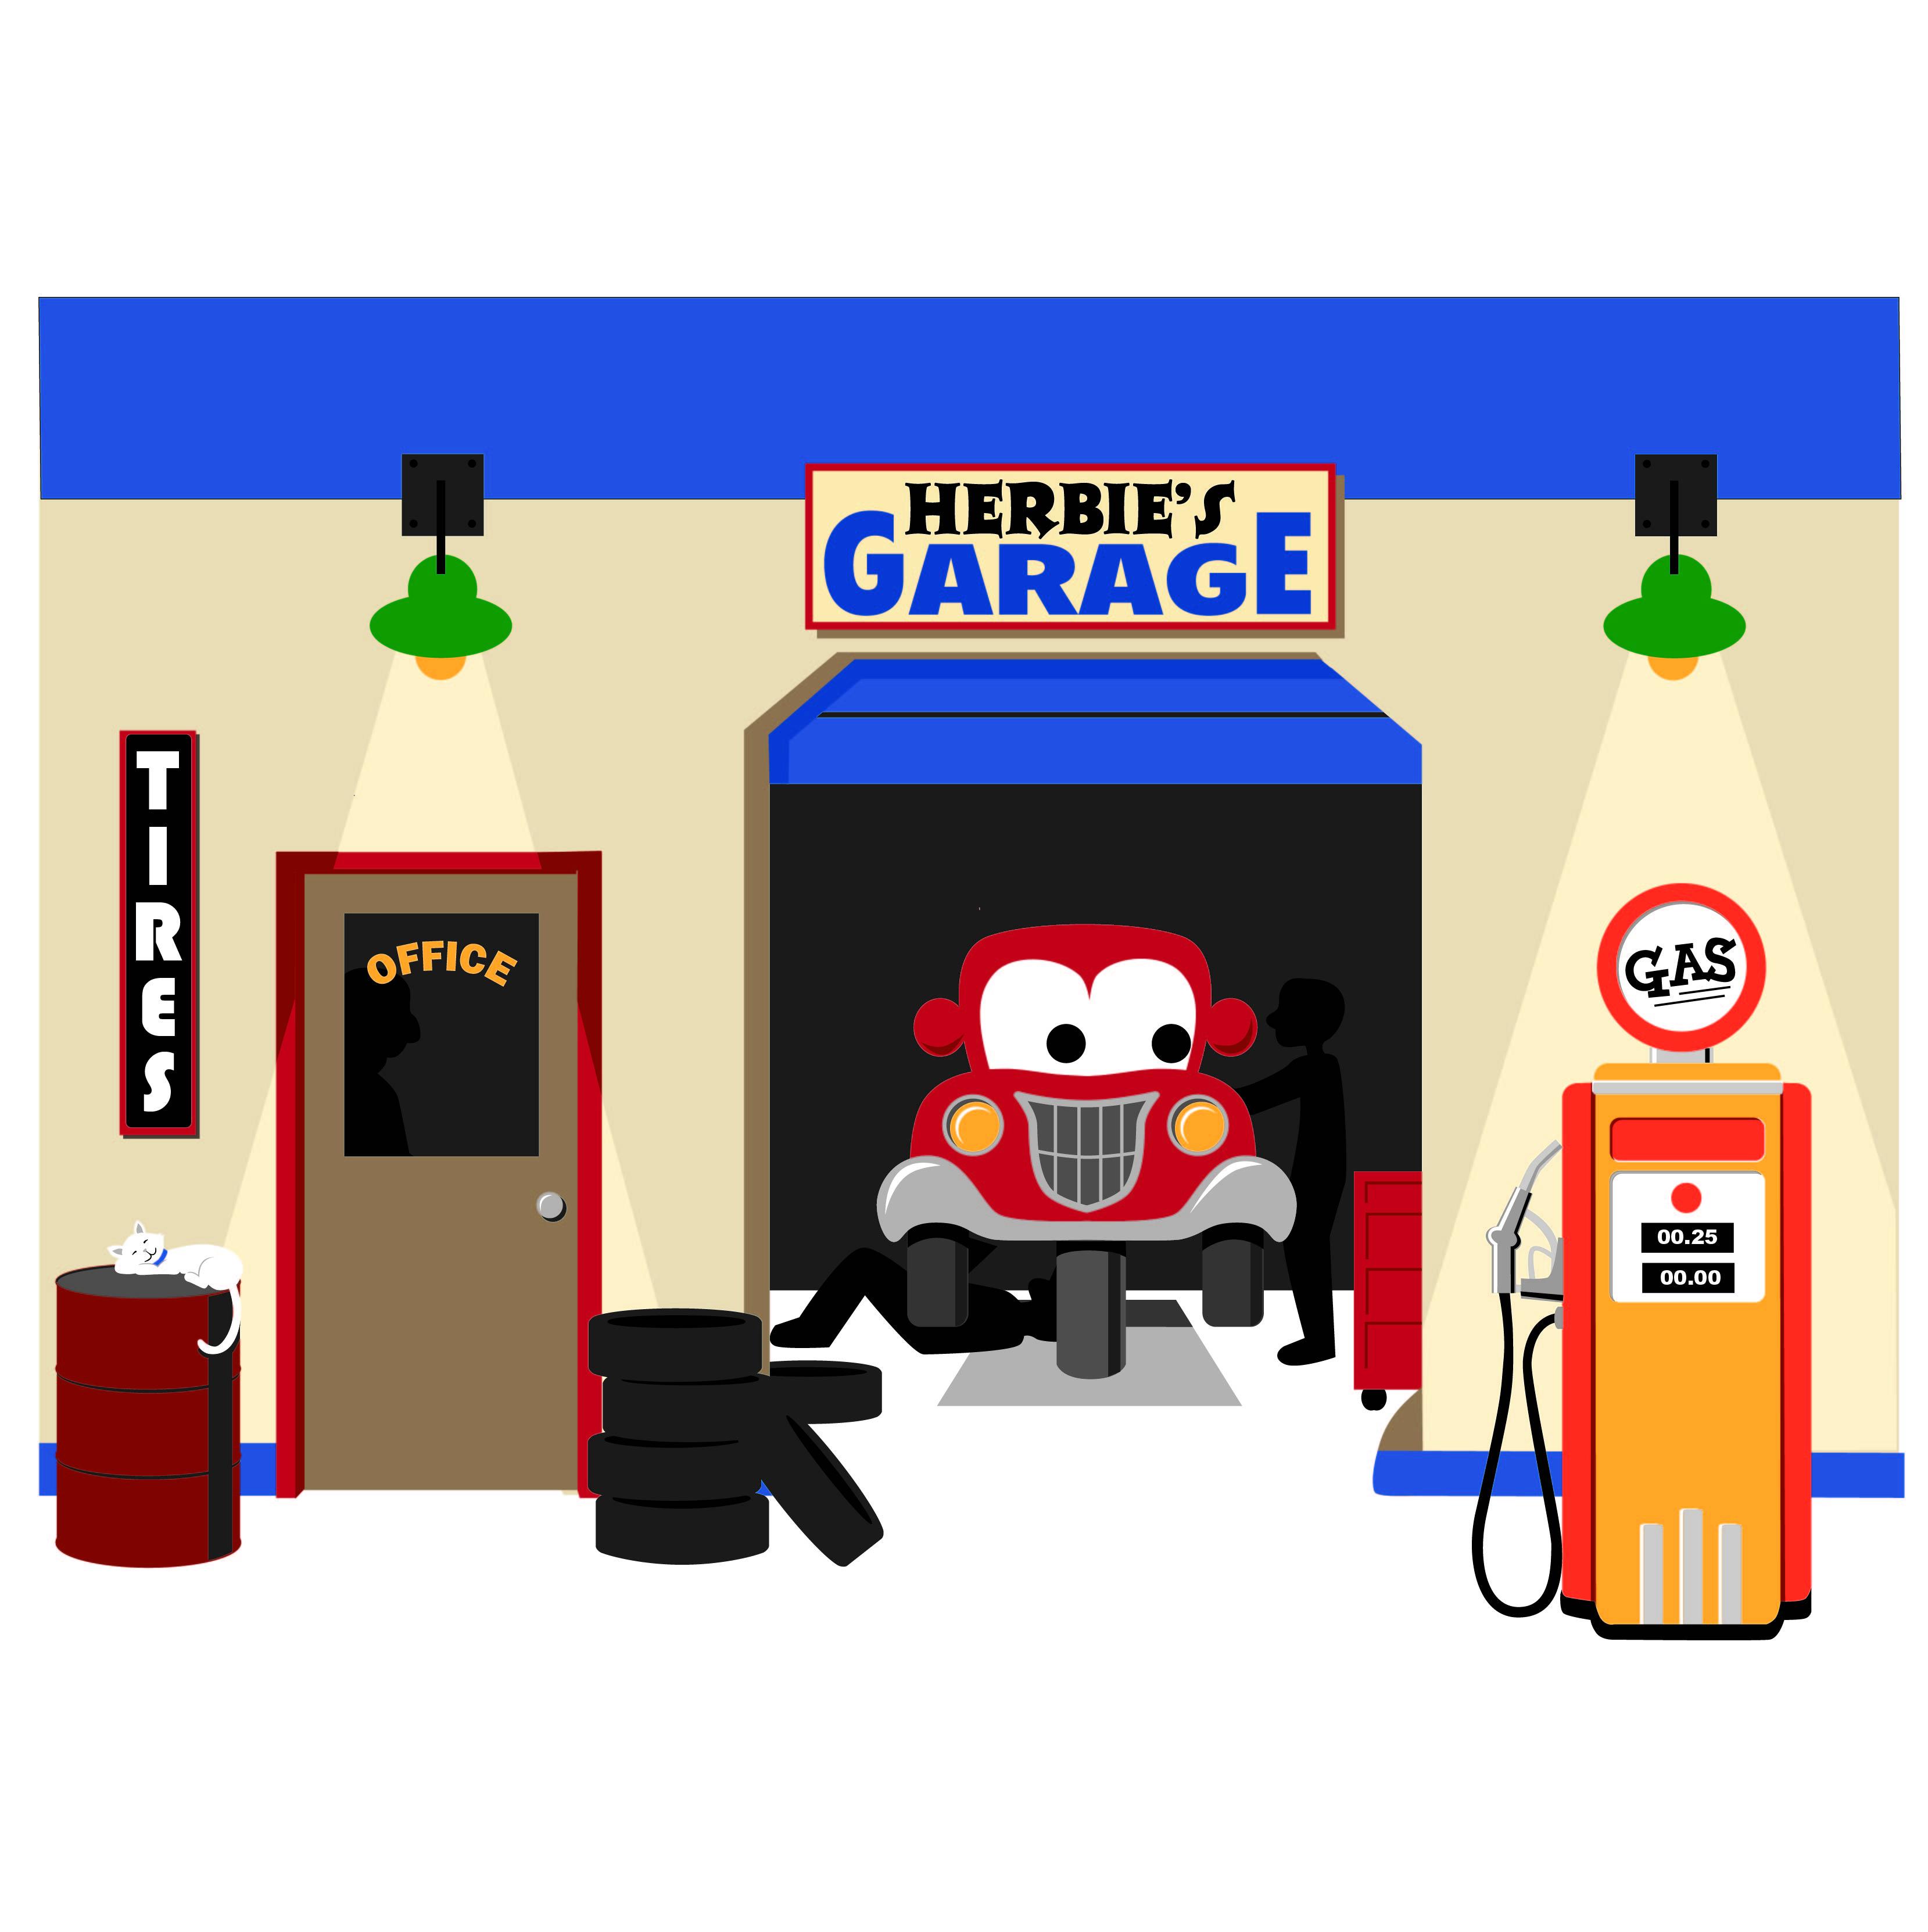 free garage cliparts  download free clip art  free clip yard sale clipart pictures yard sale clip art image